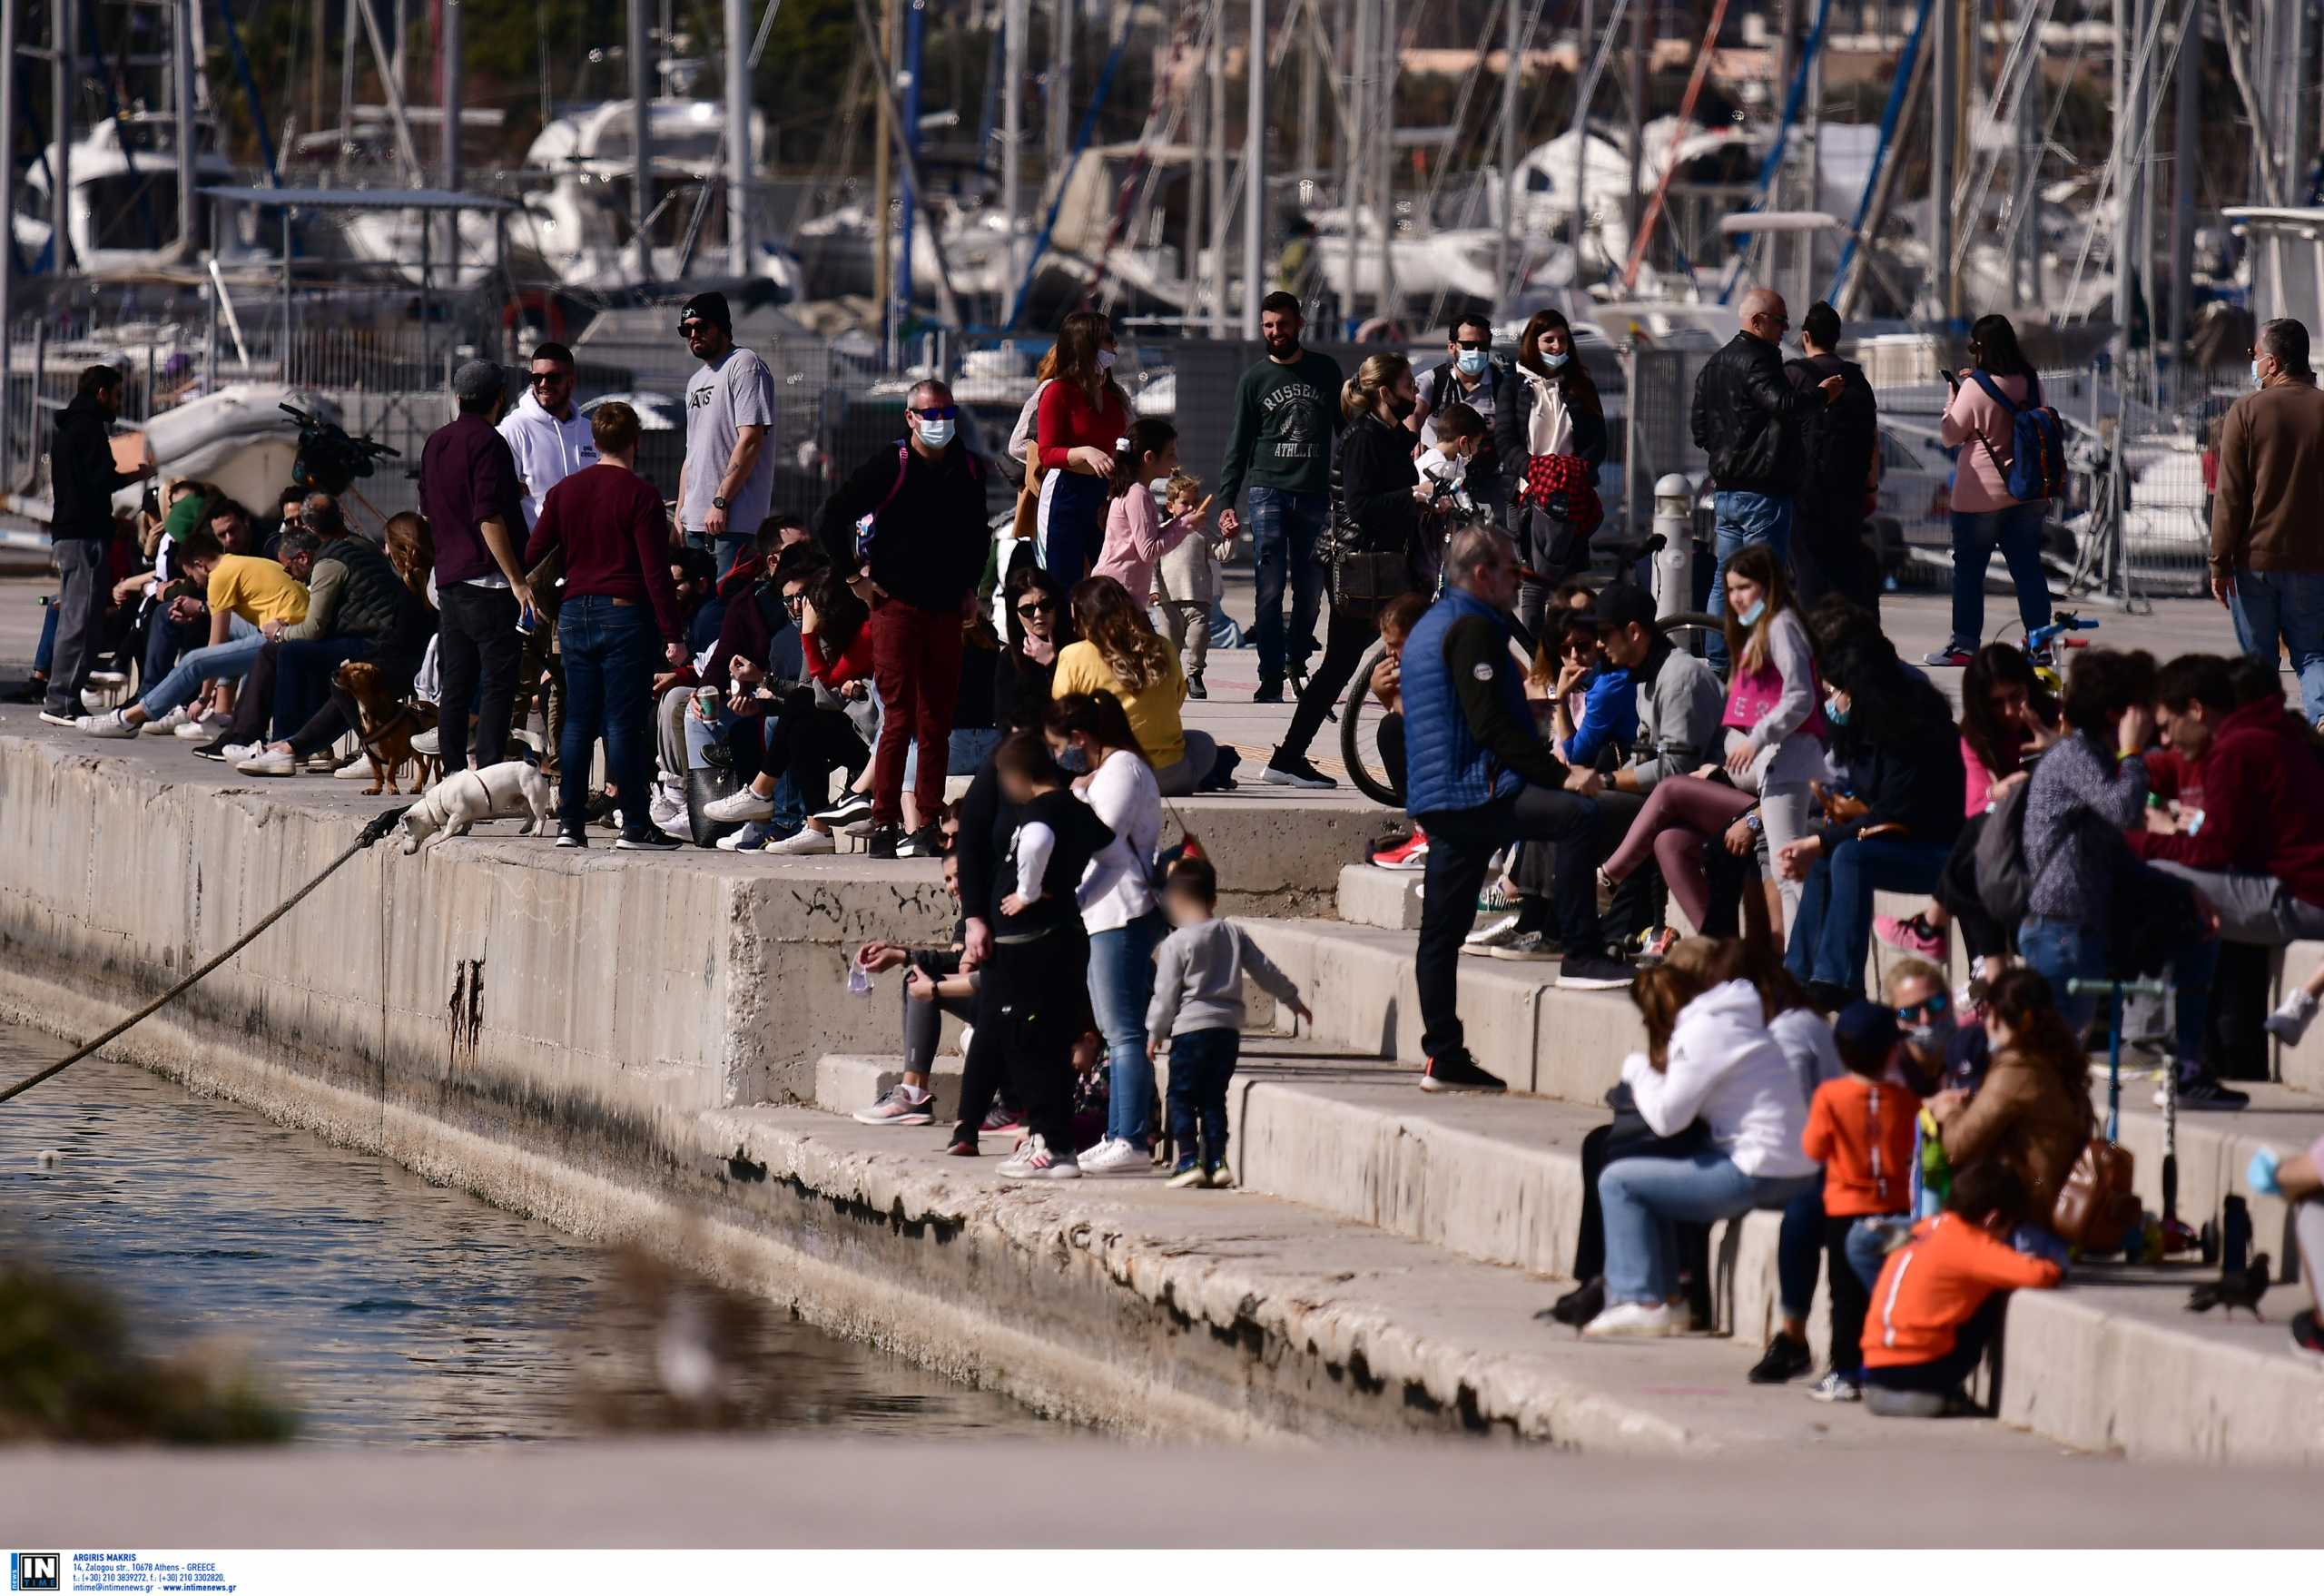 Lockdown: Και βουνό και θάλασσα – Βόλτα και αστυνομικά μπλόκα σε Φάληρο και Πάρνηθα (pics)